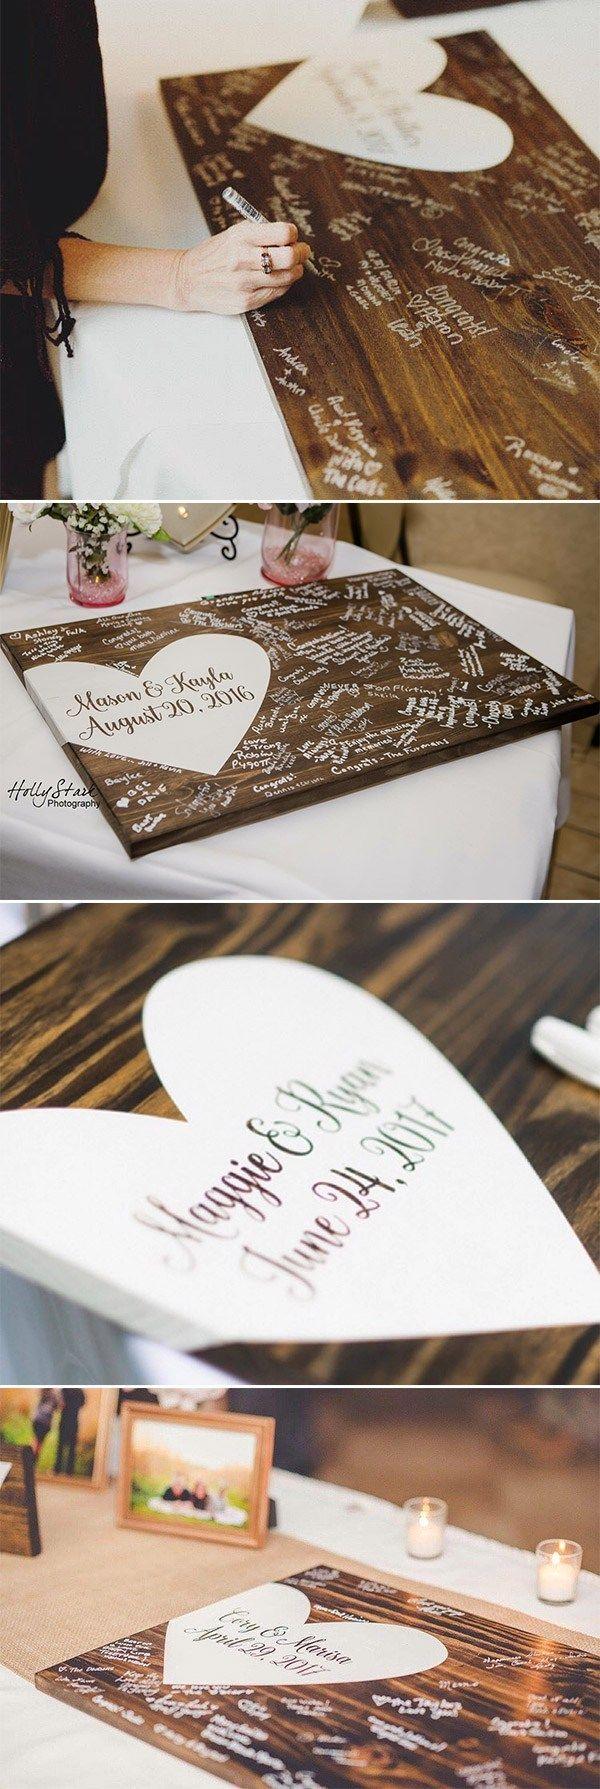 20 Rustic Wedding Guest Book Ideas - Hochzeitskleid #holzideen